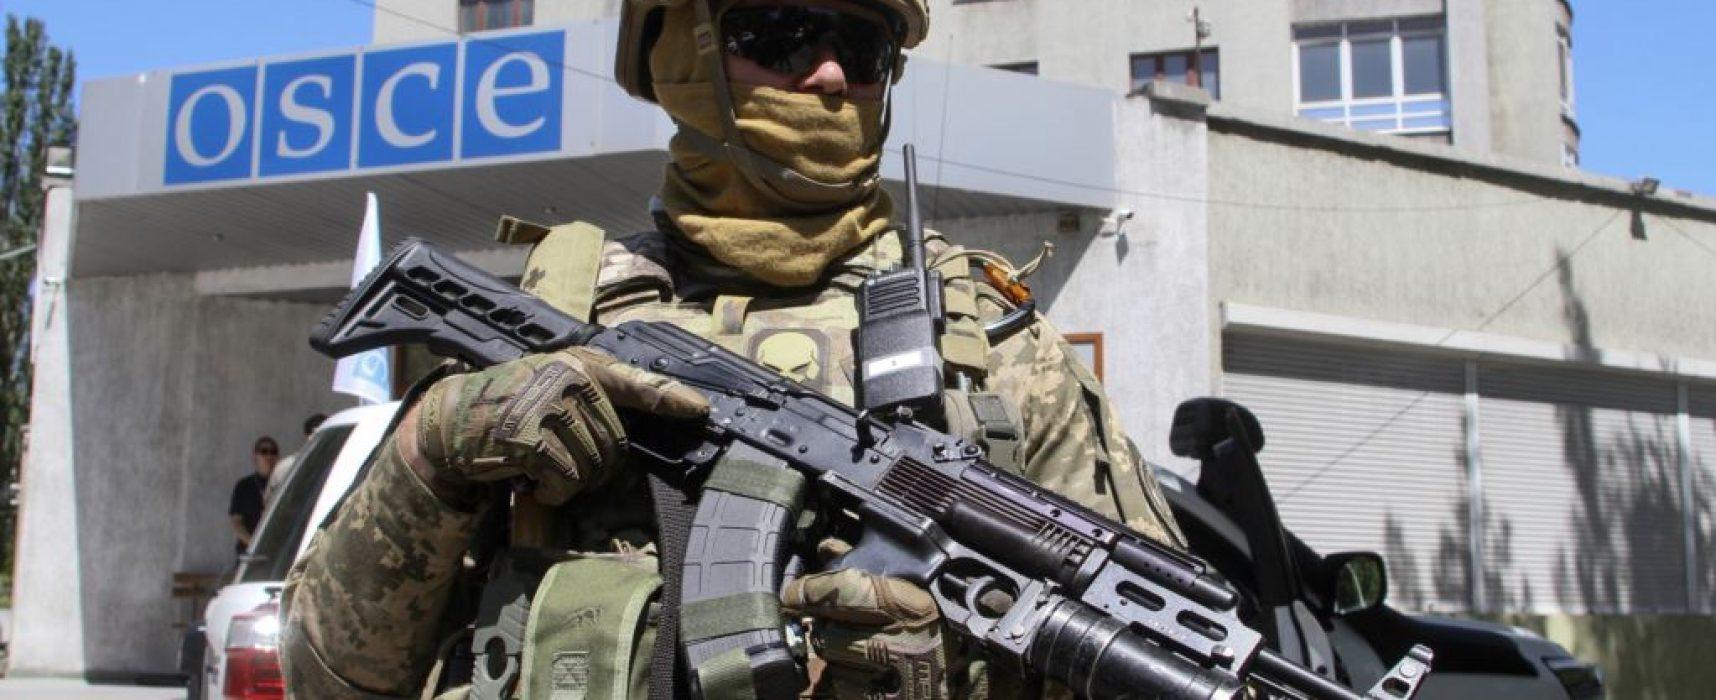 OSCE interview fuels Kremlin disinformation